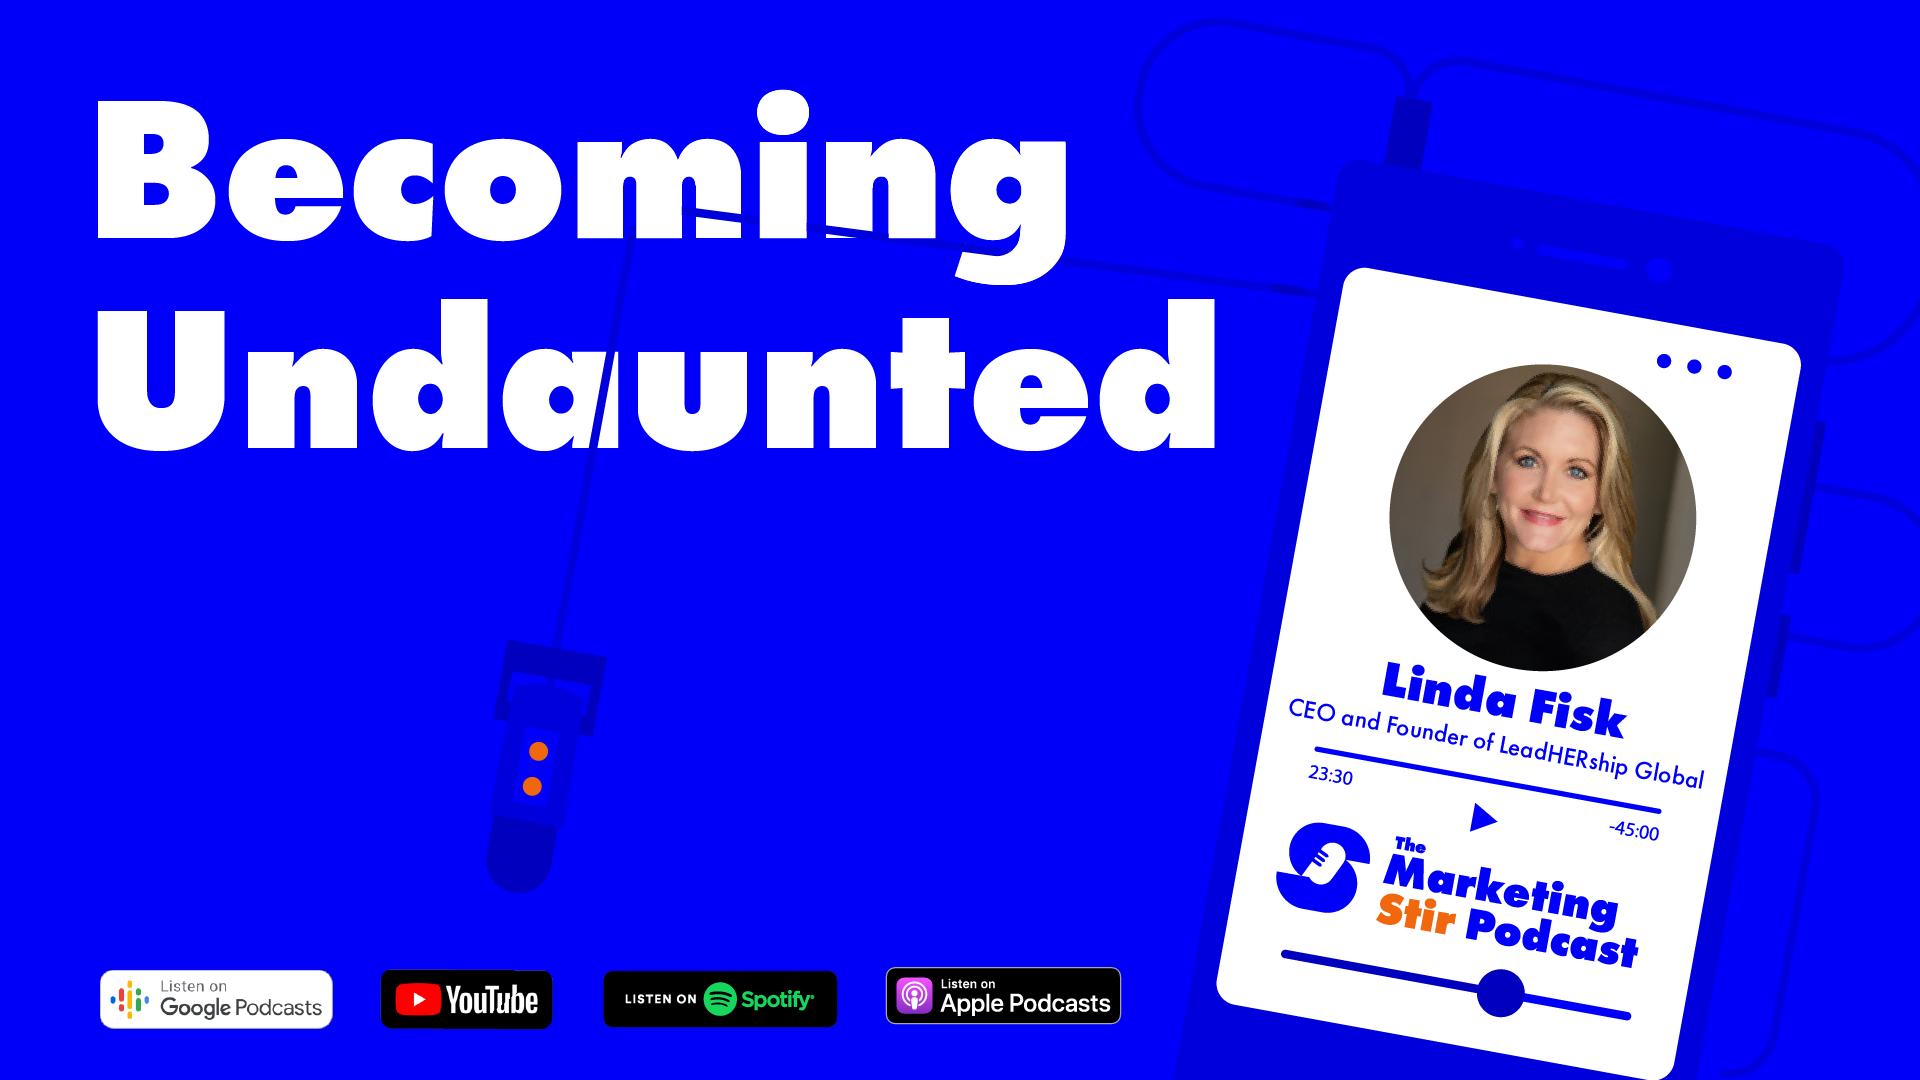 Linda Fisk (LeadHERship Global) - Becoming Undaunted